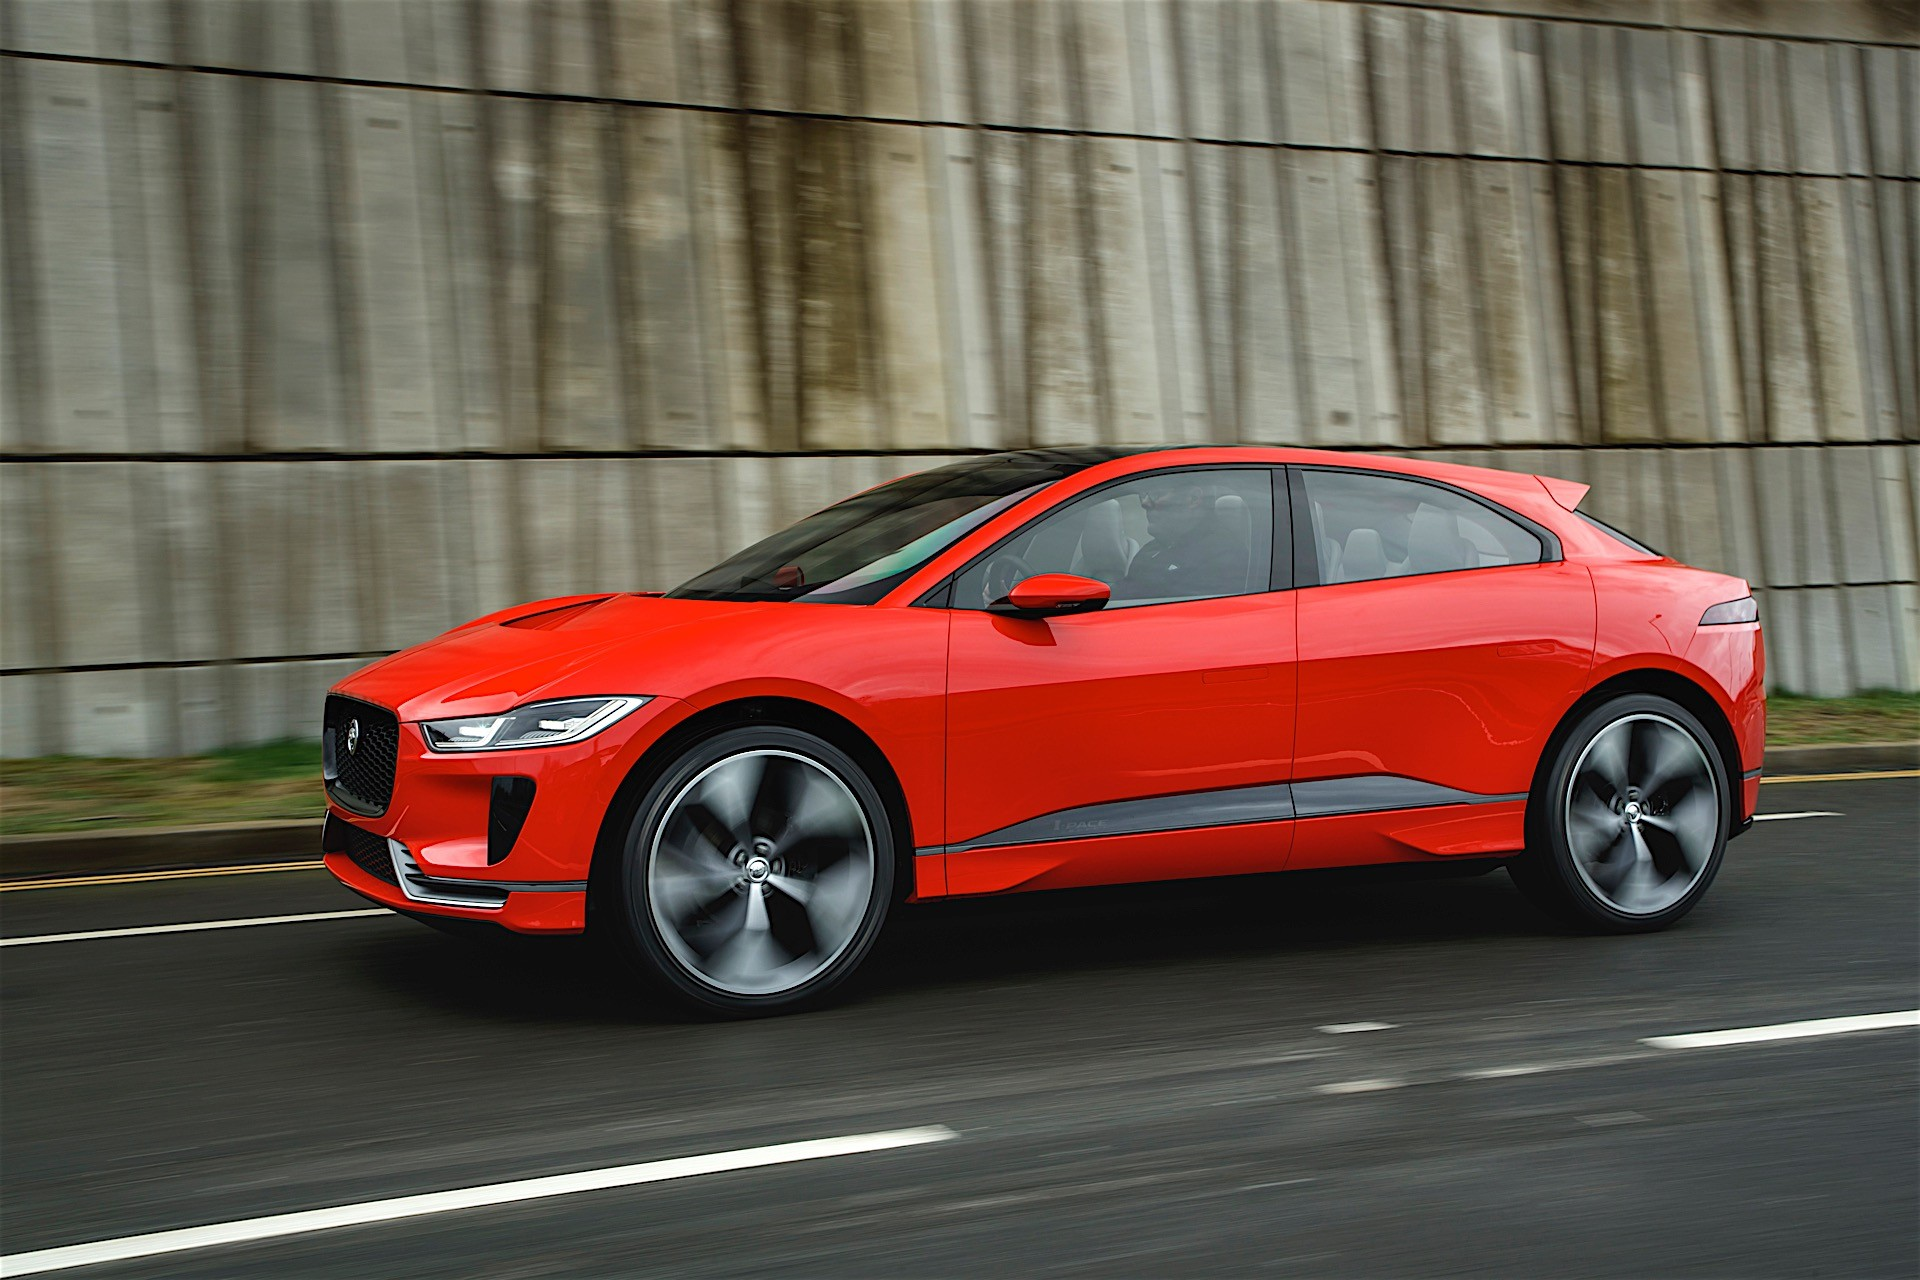 2019 jaguar i pace drifts on frozen lake in the hands of pro driver autoevolution. Black Bedroom Furniture Sets. Home Design Ideas